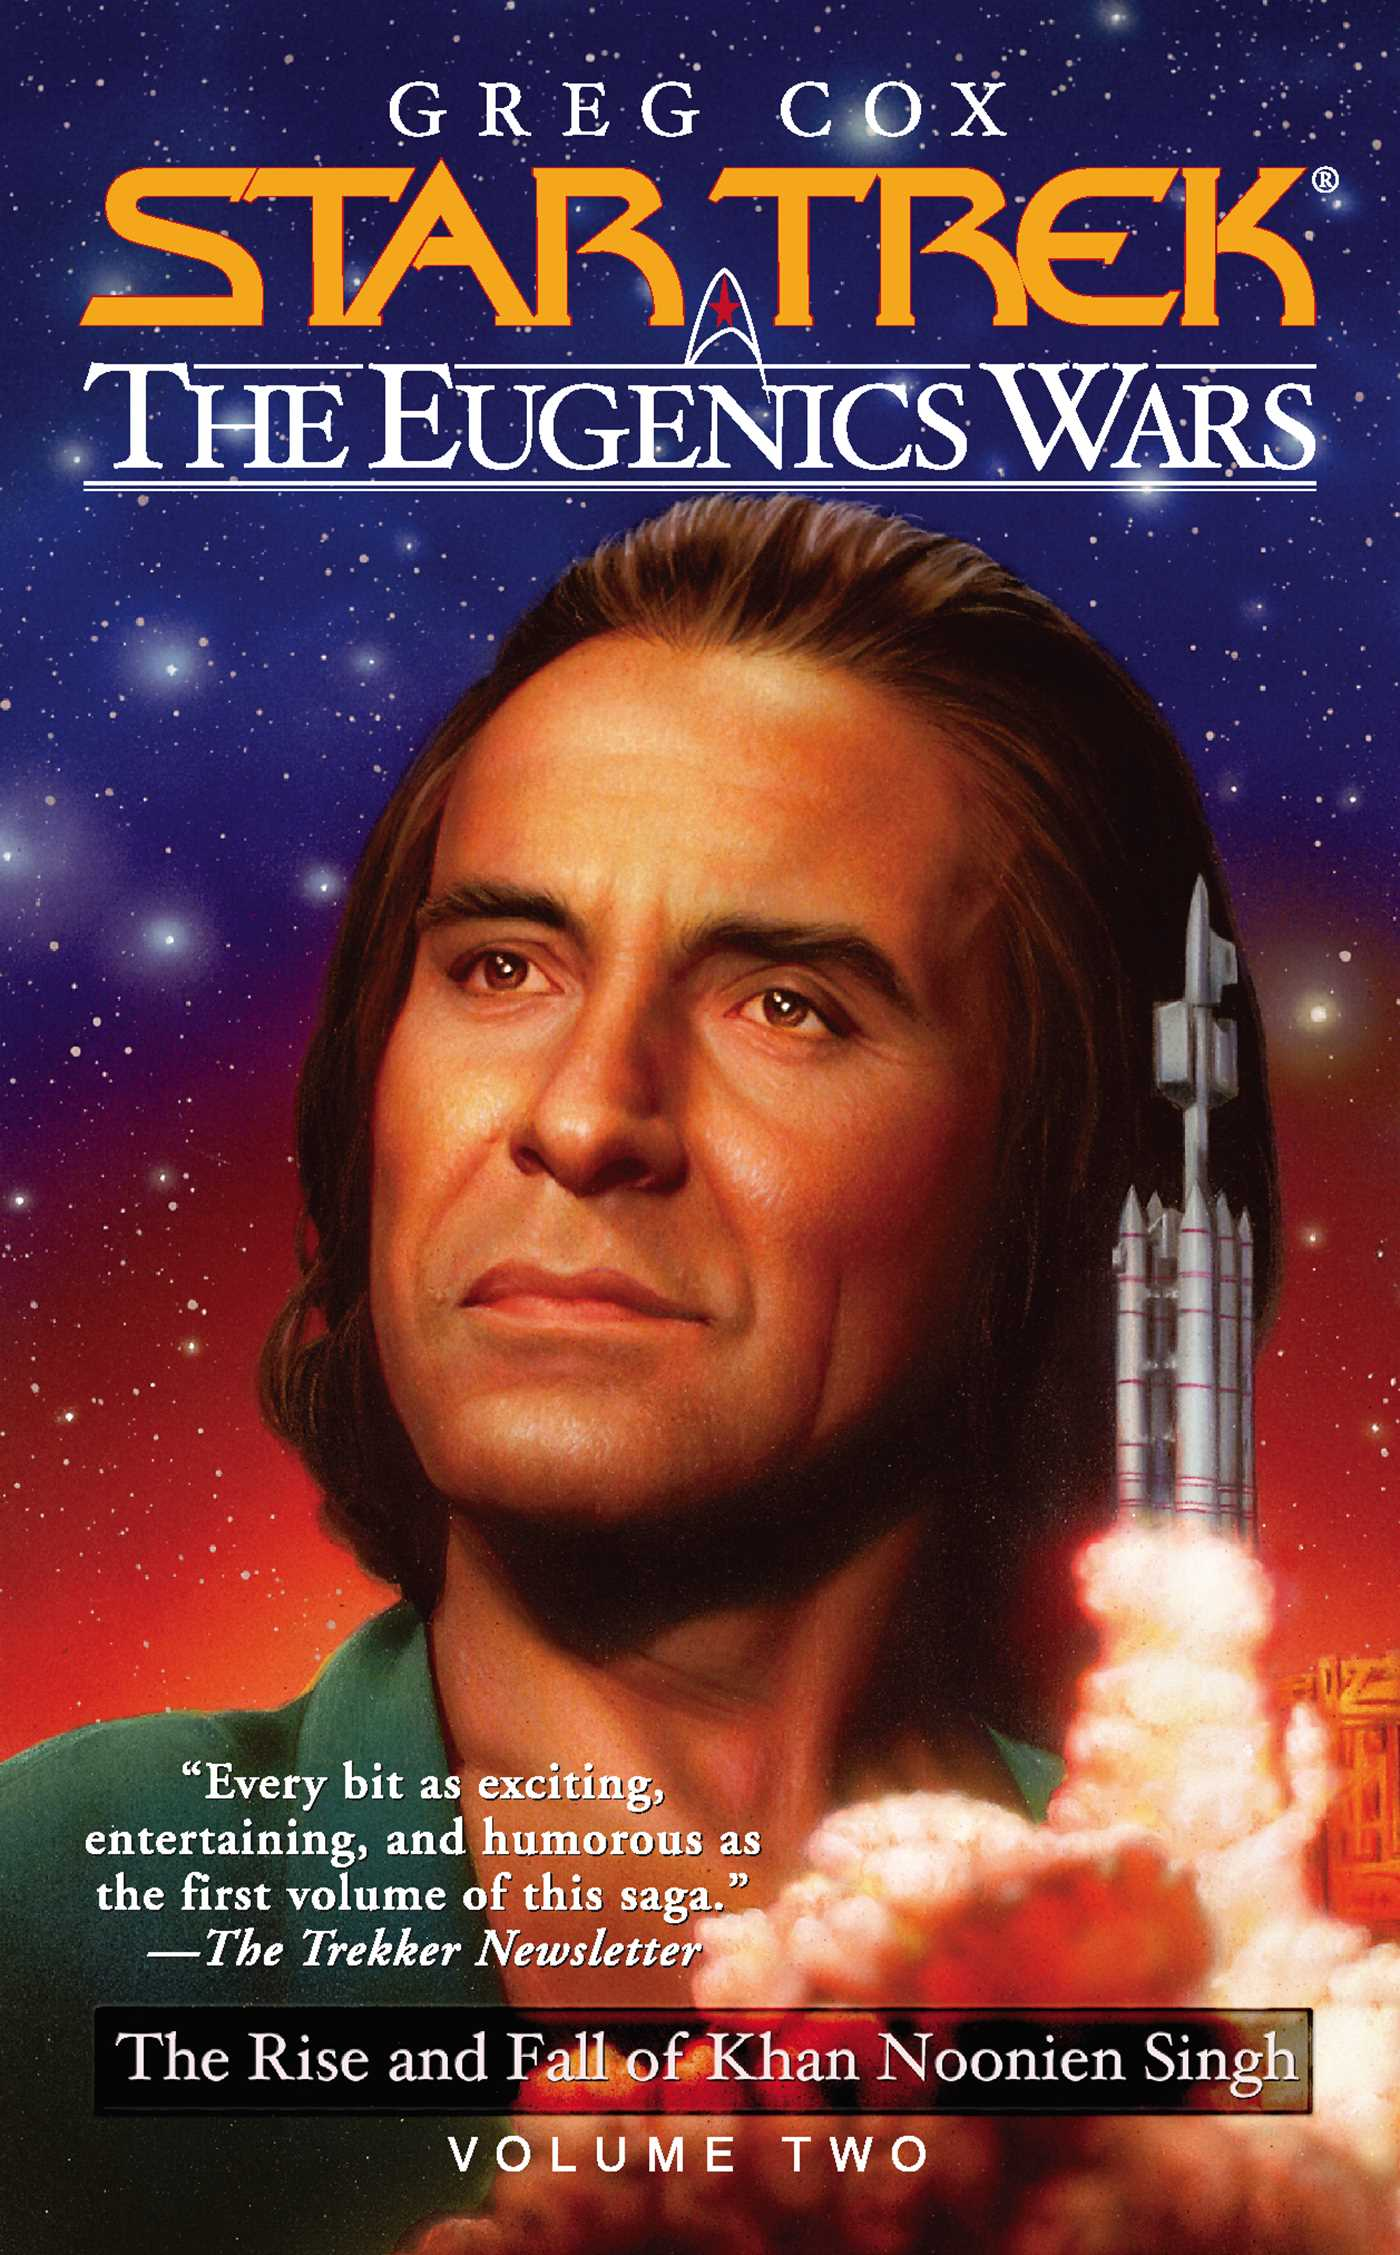 The eugenics wars 9780743451635 hr